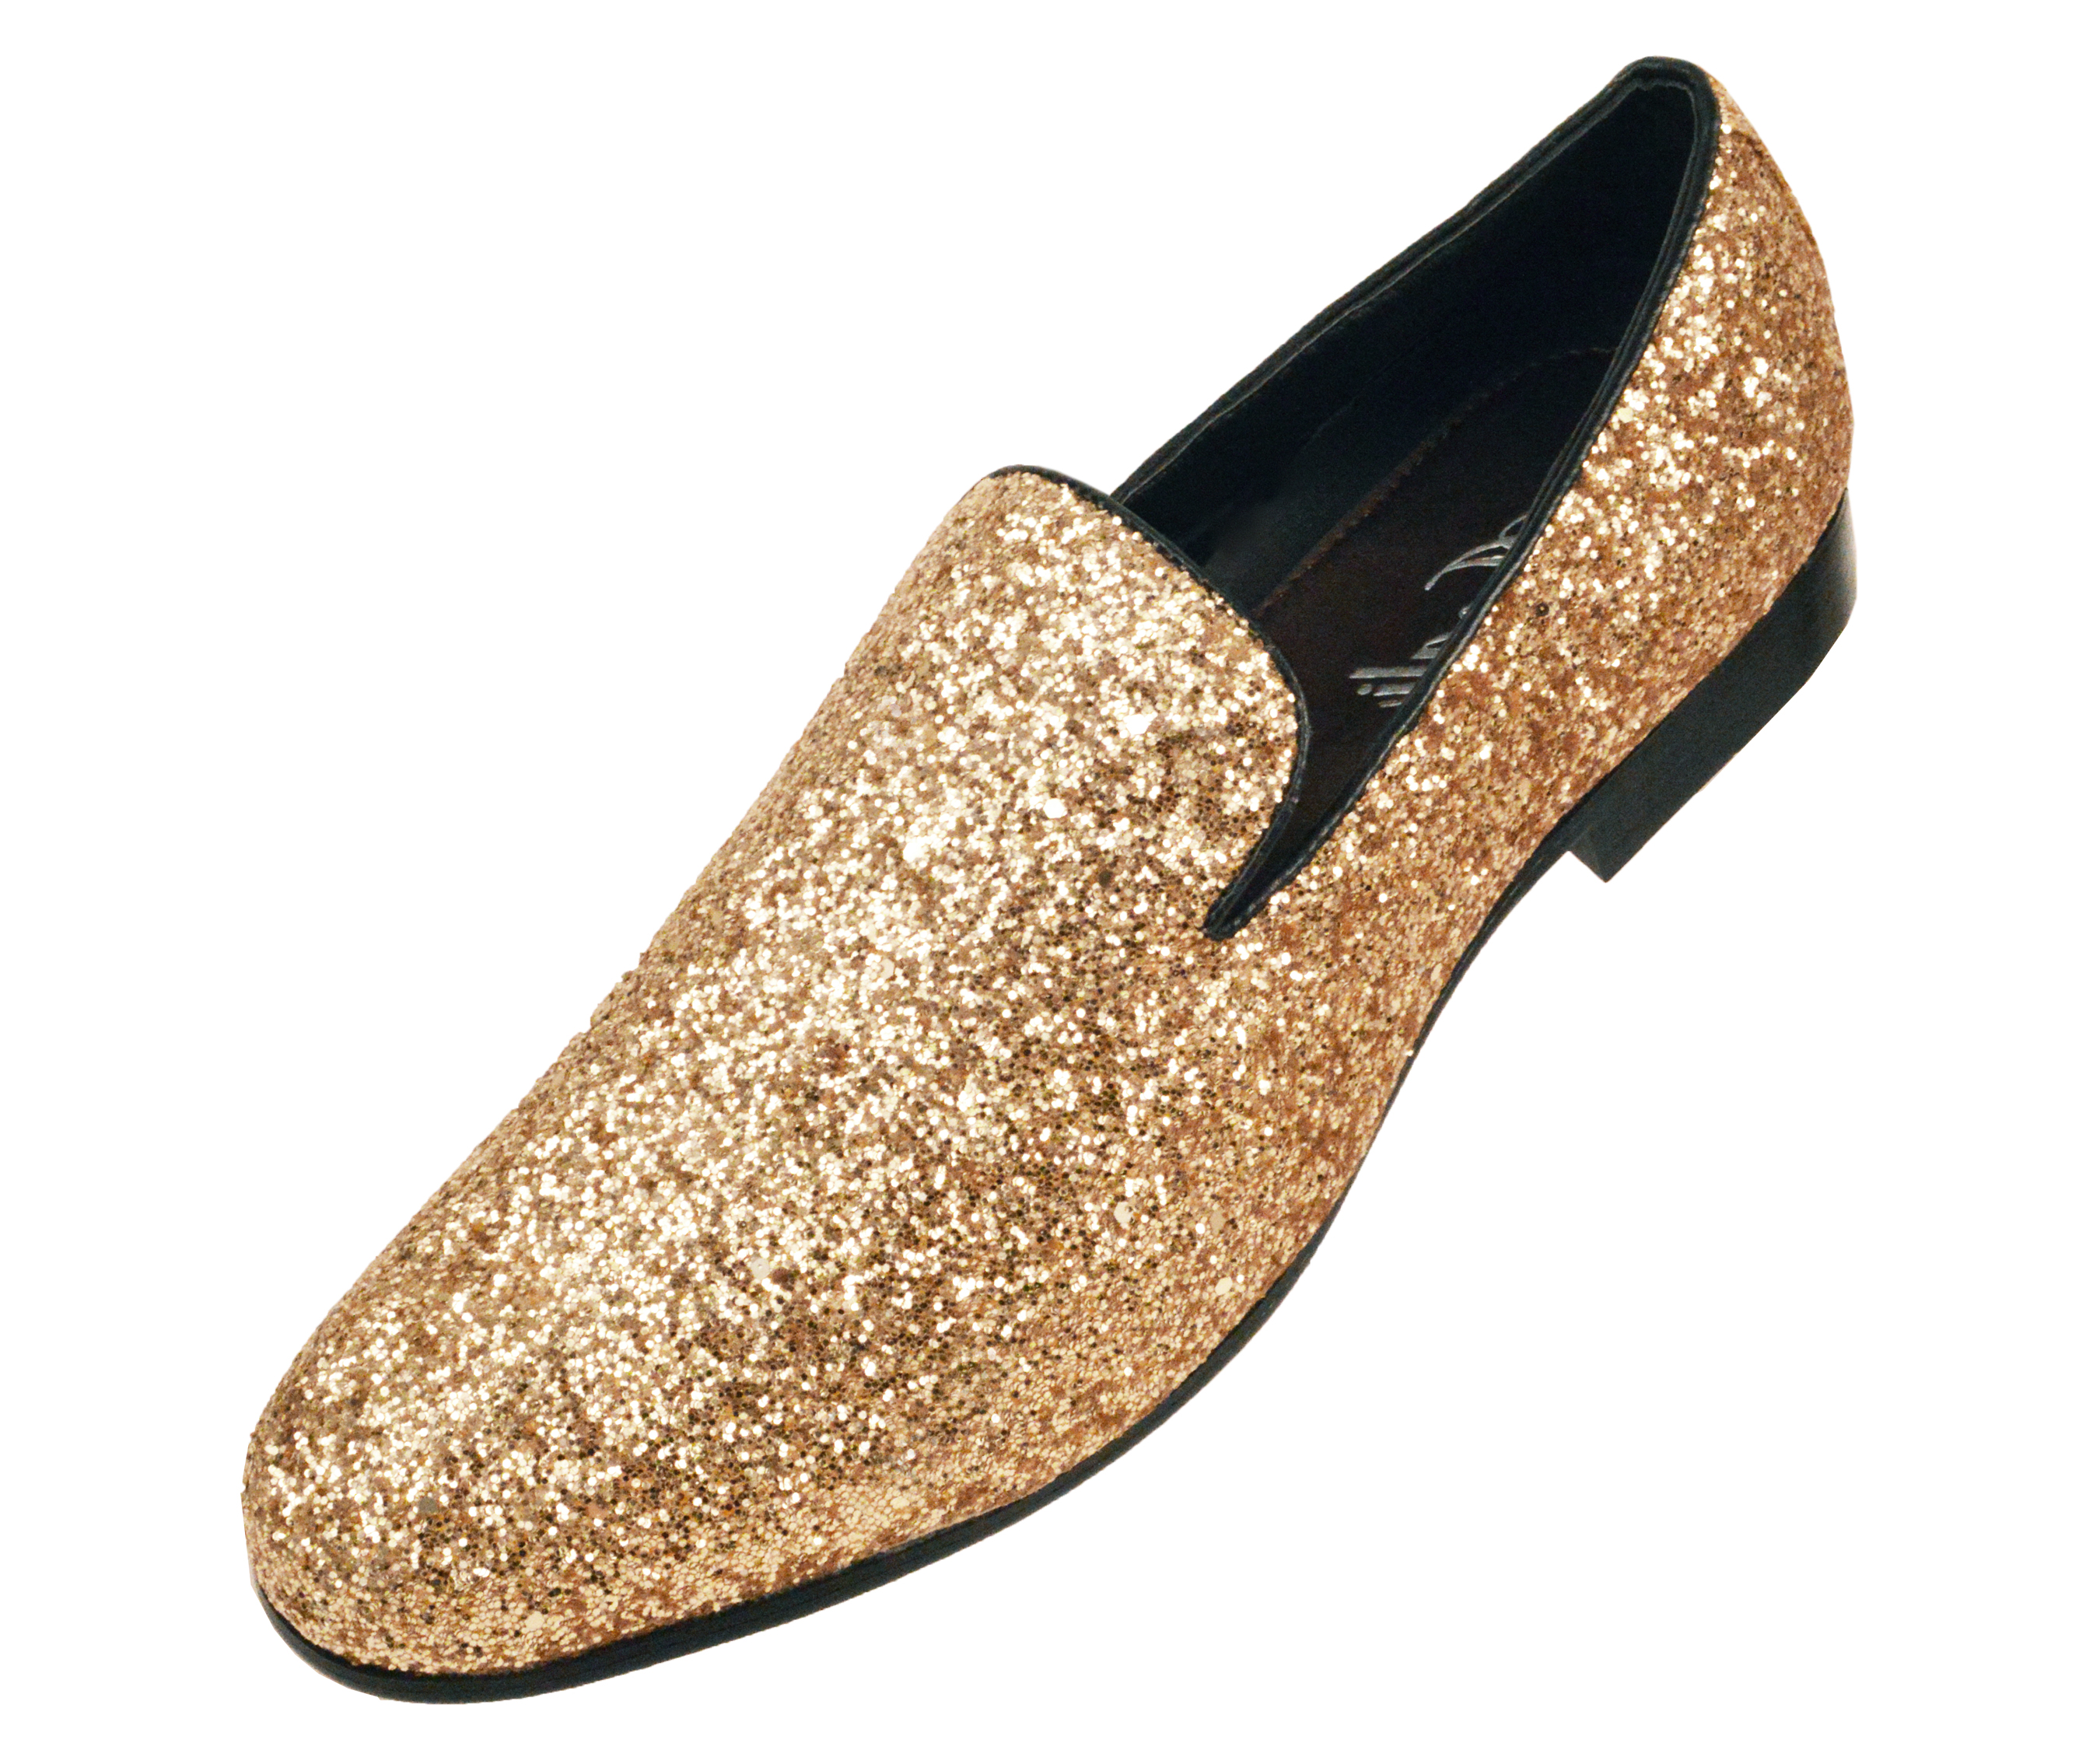 Amali Mens Metallic Sparkling Glitter Tuxedo Slip on Smoking Slipper Dress Shoe